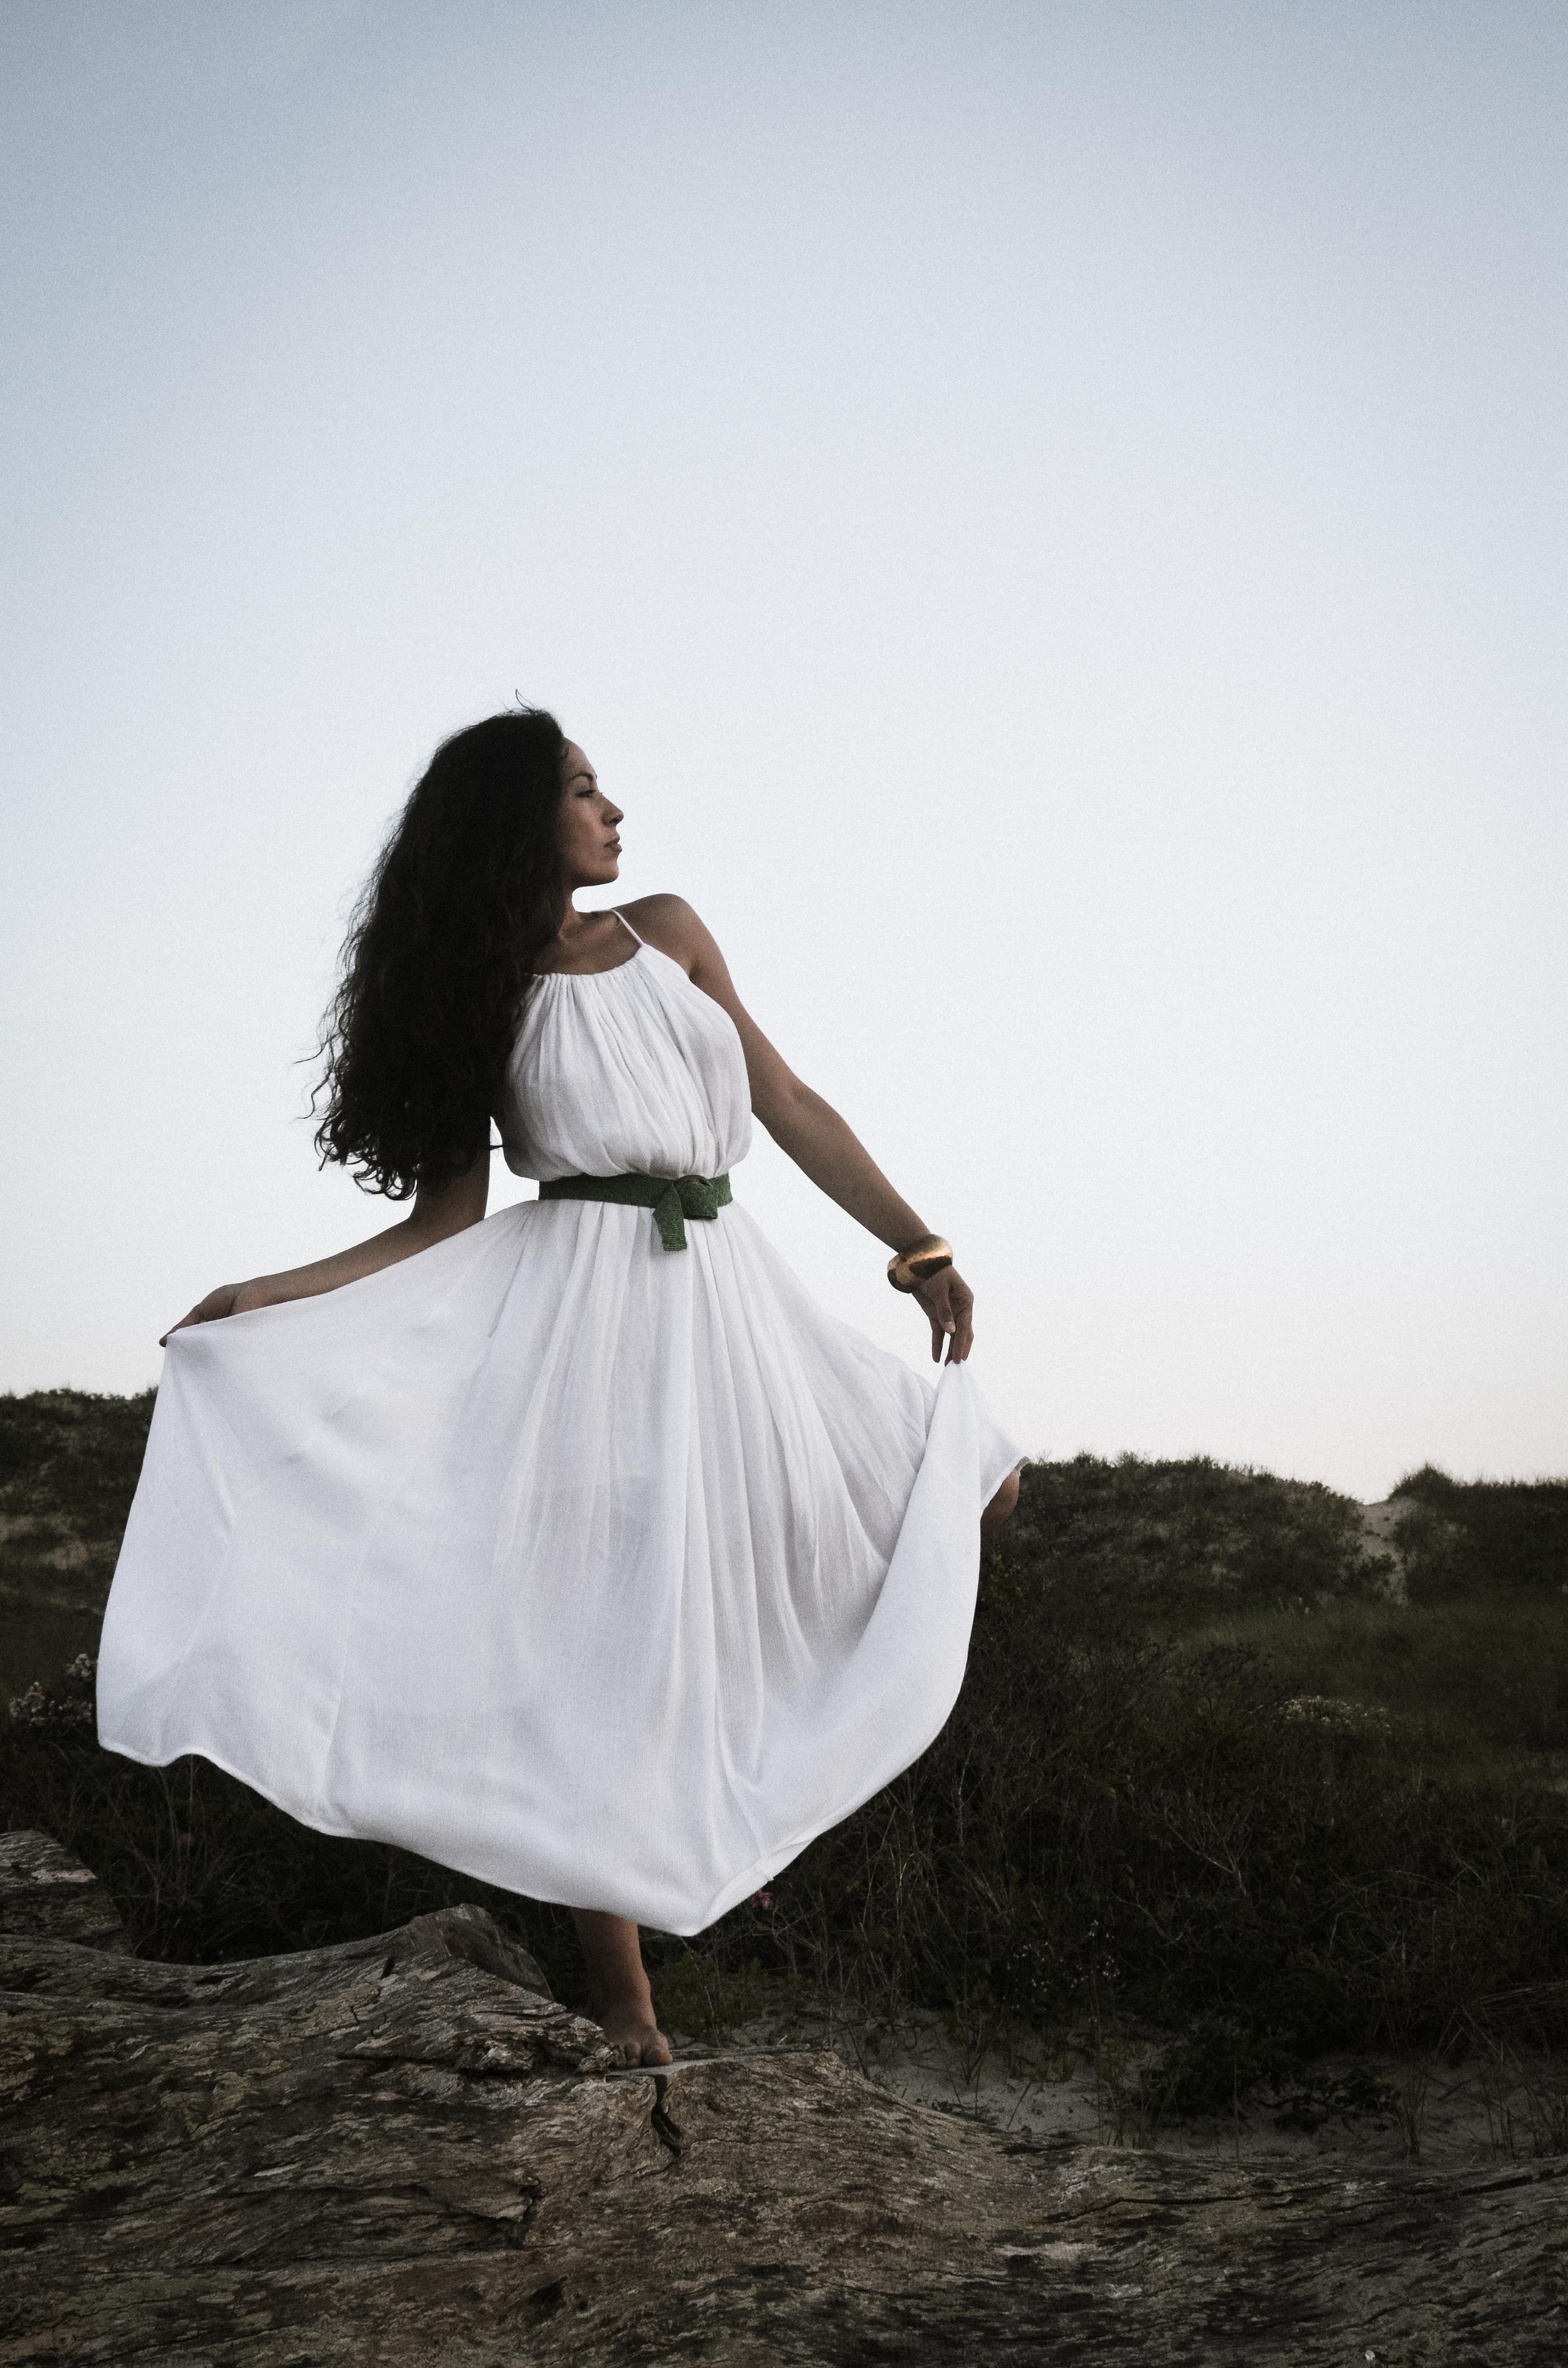 Emma_white dress2 (1 of 1).jpg